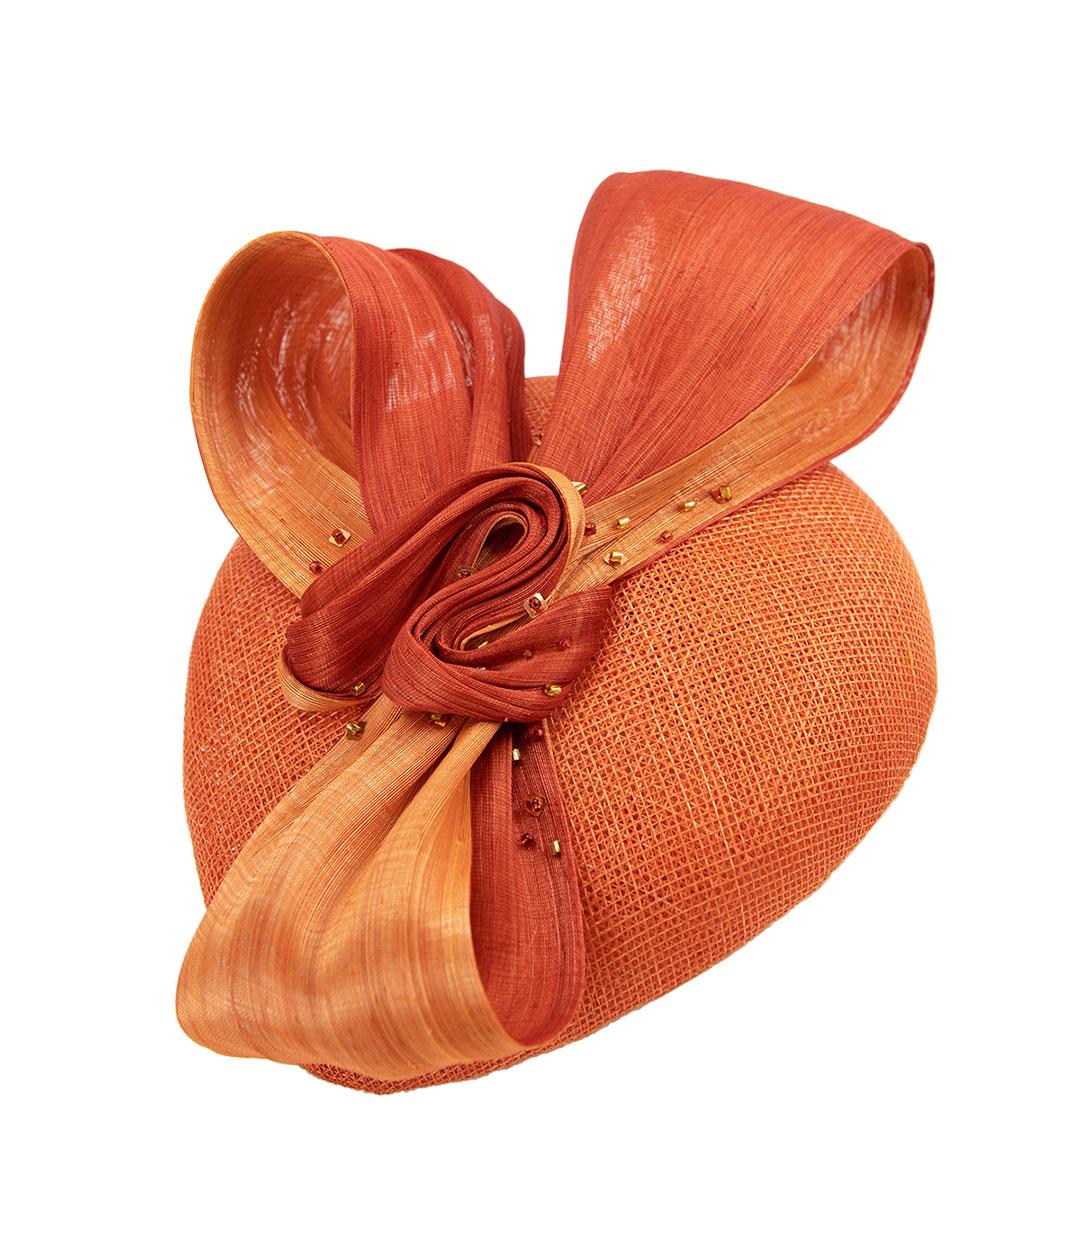 Detail view of perching beret in orange sinamay and silk abaca